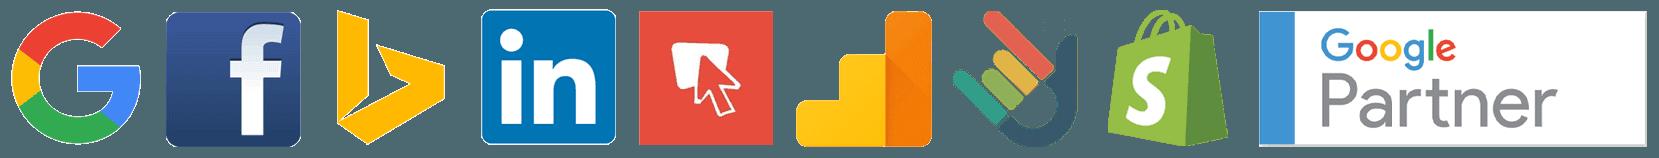 Partners & Advertising Networks - Google, Facebook, Bing, LinkedIn, Banner Snack, Analytics, DashThis